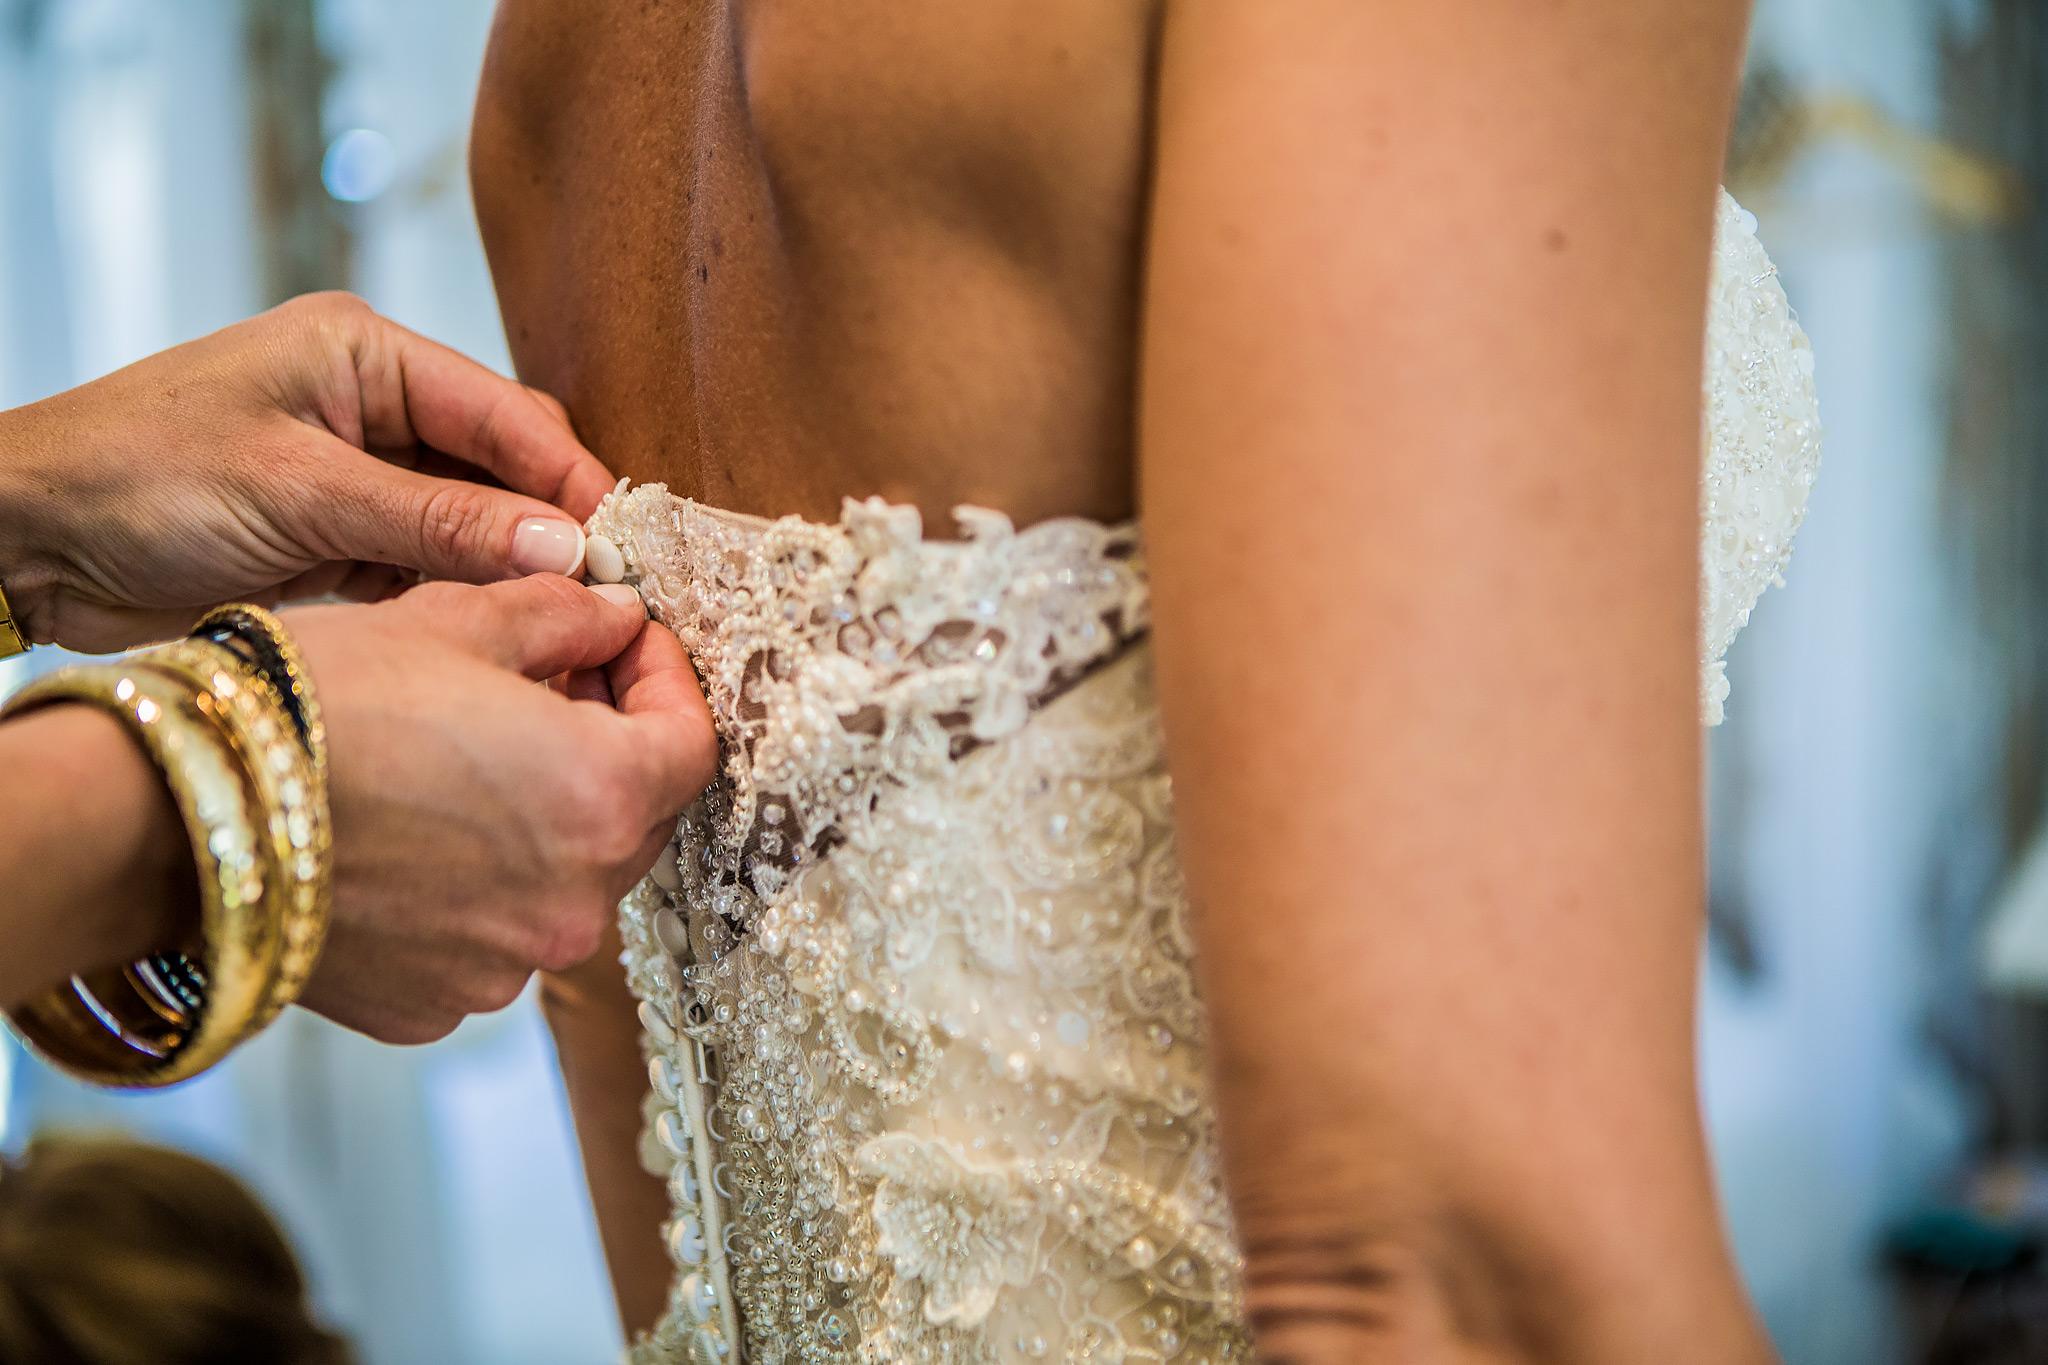 Bruidsreportage Destination Wedding Ibiza Mandy en Joost 005 - Bas Driessen Fotografie